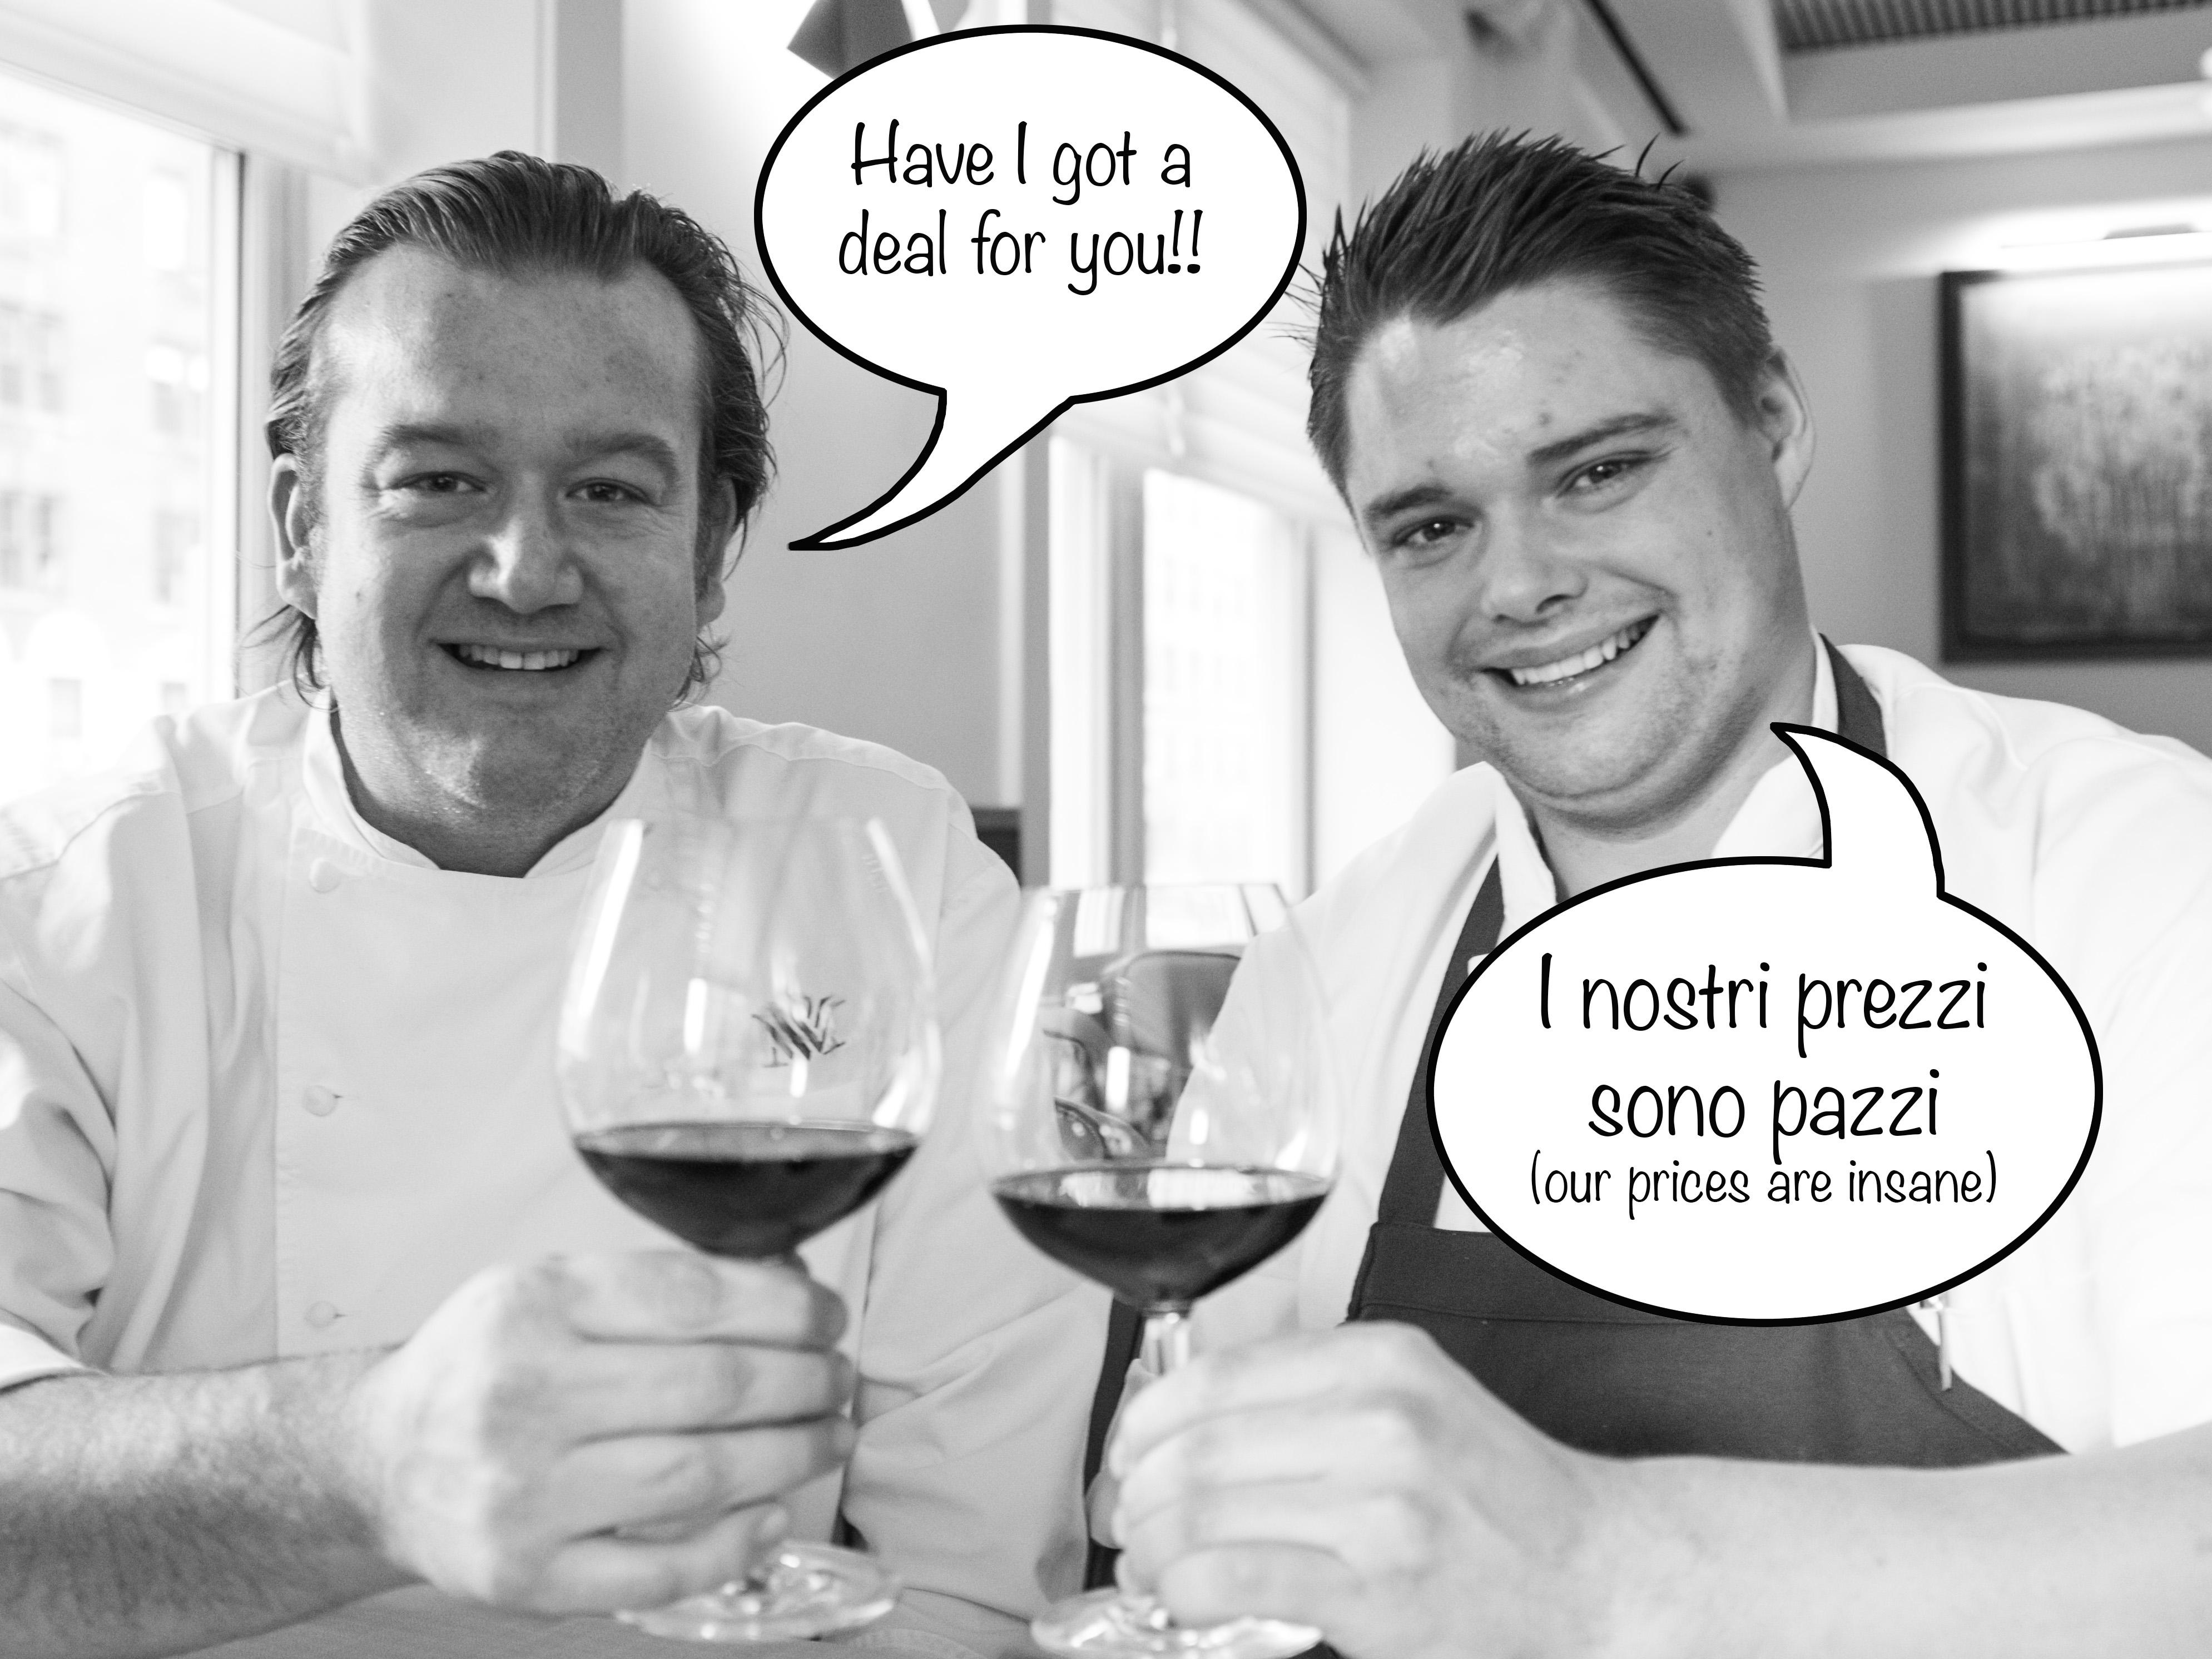 Michael White and Gordon Finn